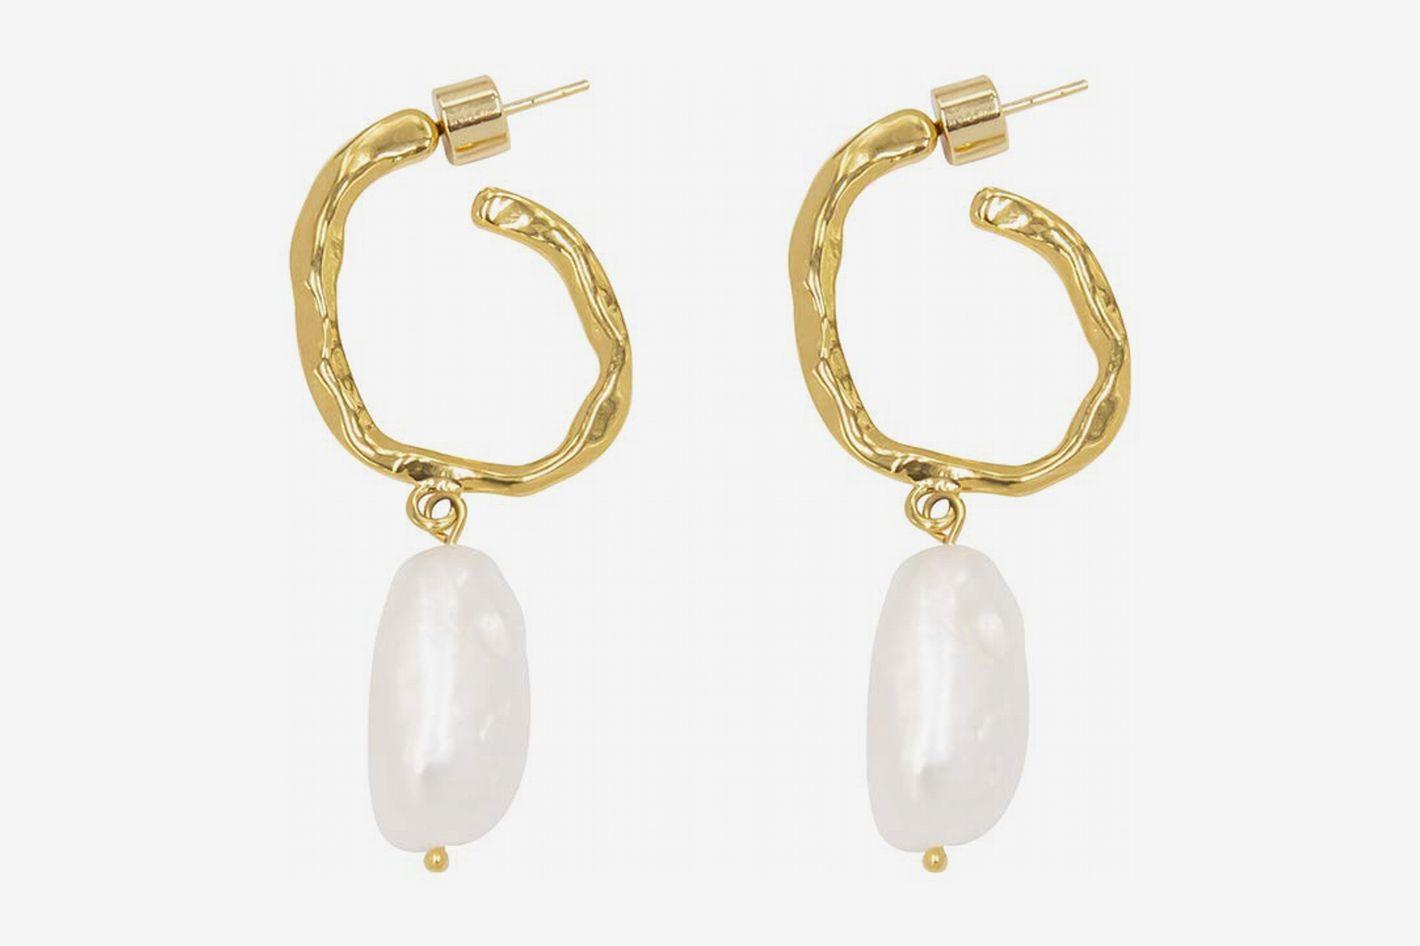 LANE WOODS Genuine Freshwater Cultured Pearl Drop Stud Earrings with Sterling Silver Post